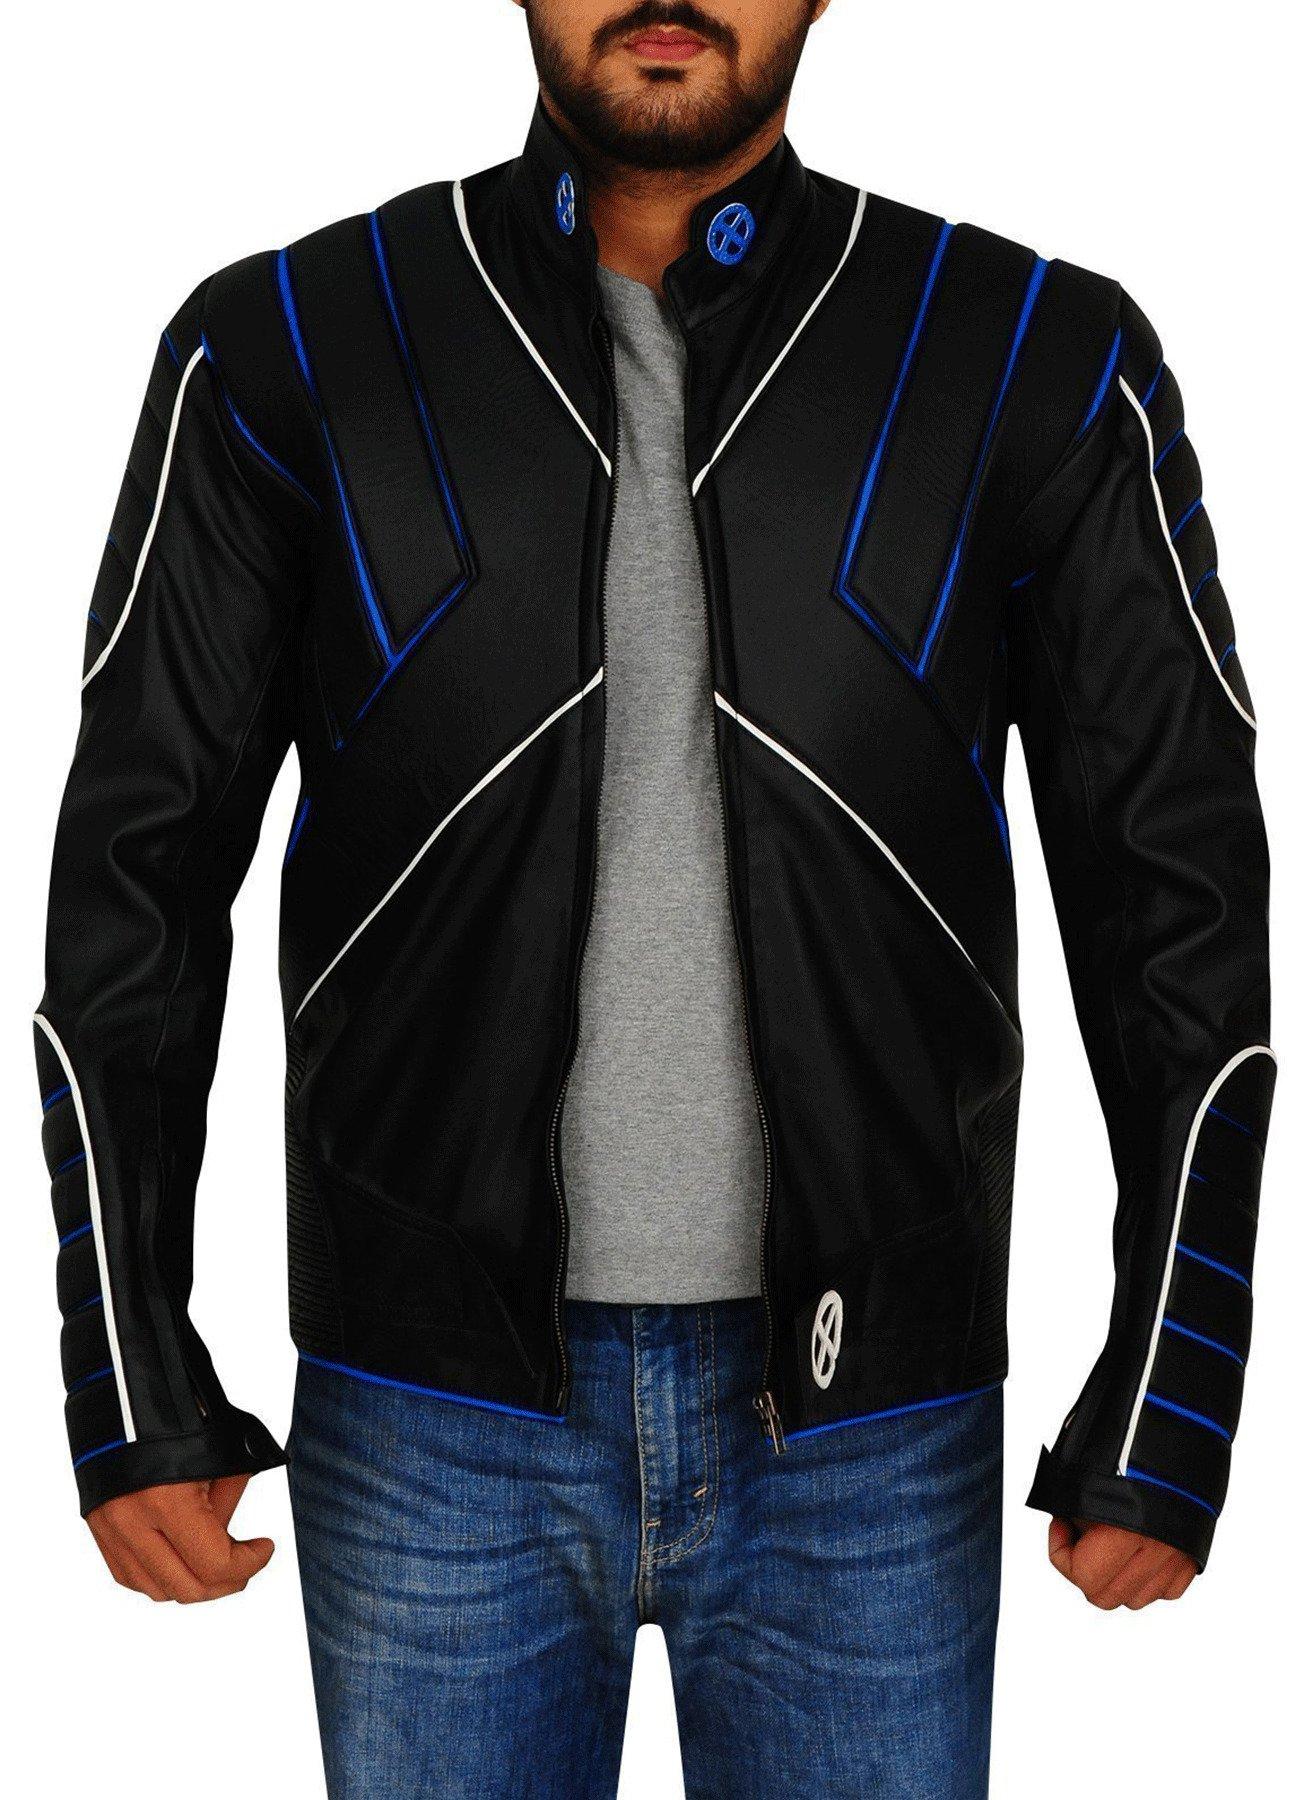 X-Men Cyclops Cosplay Black Faux Leather Jacket